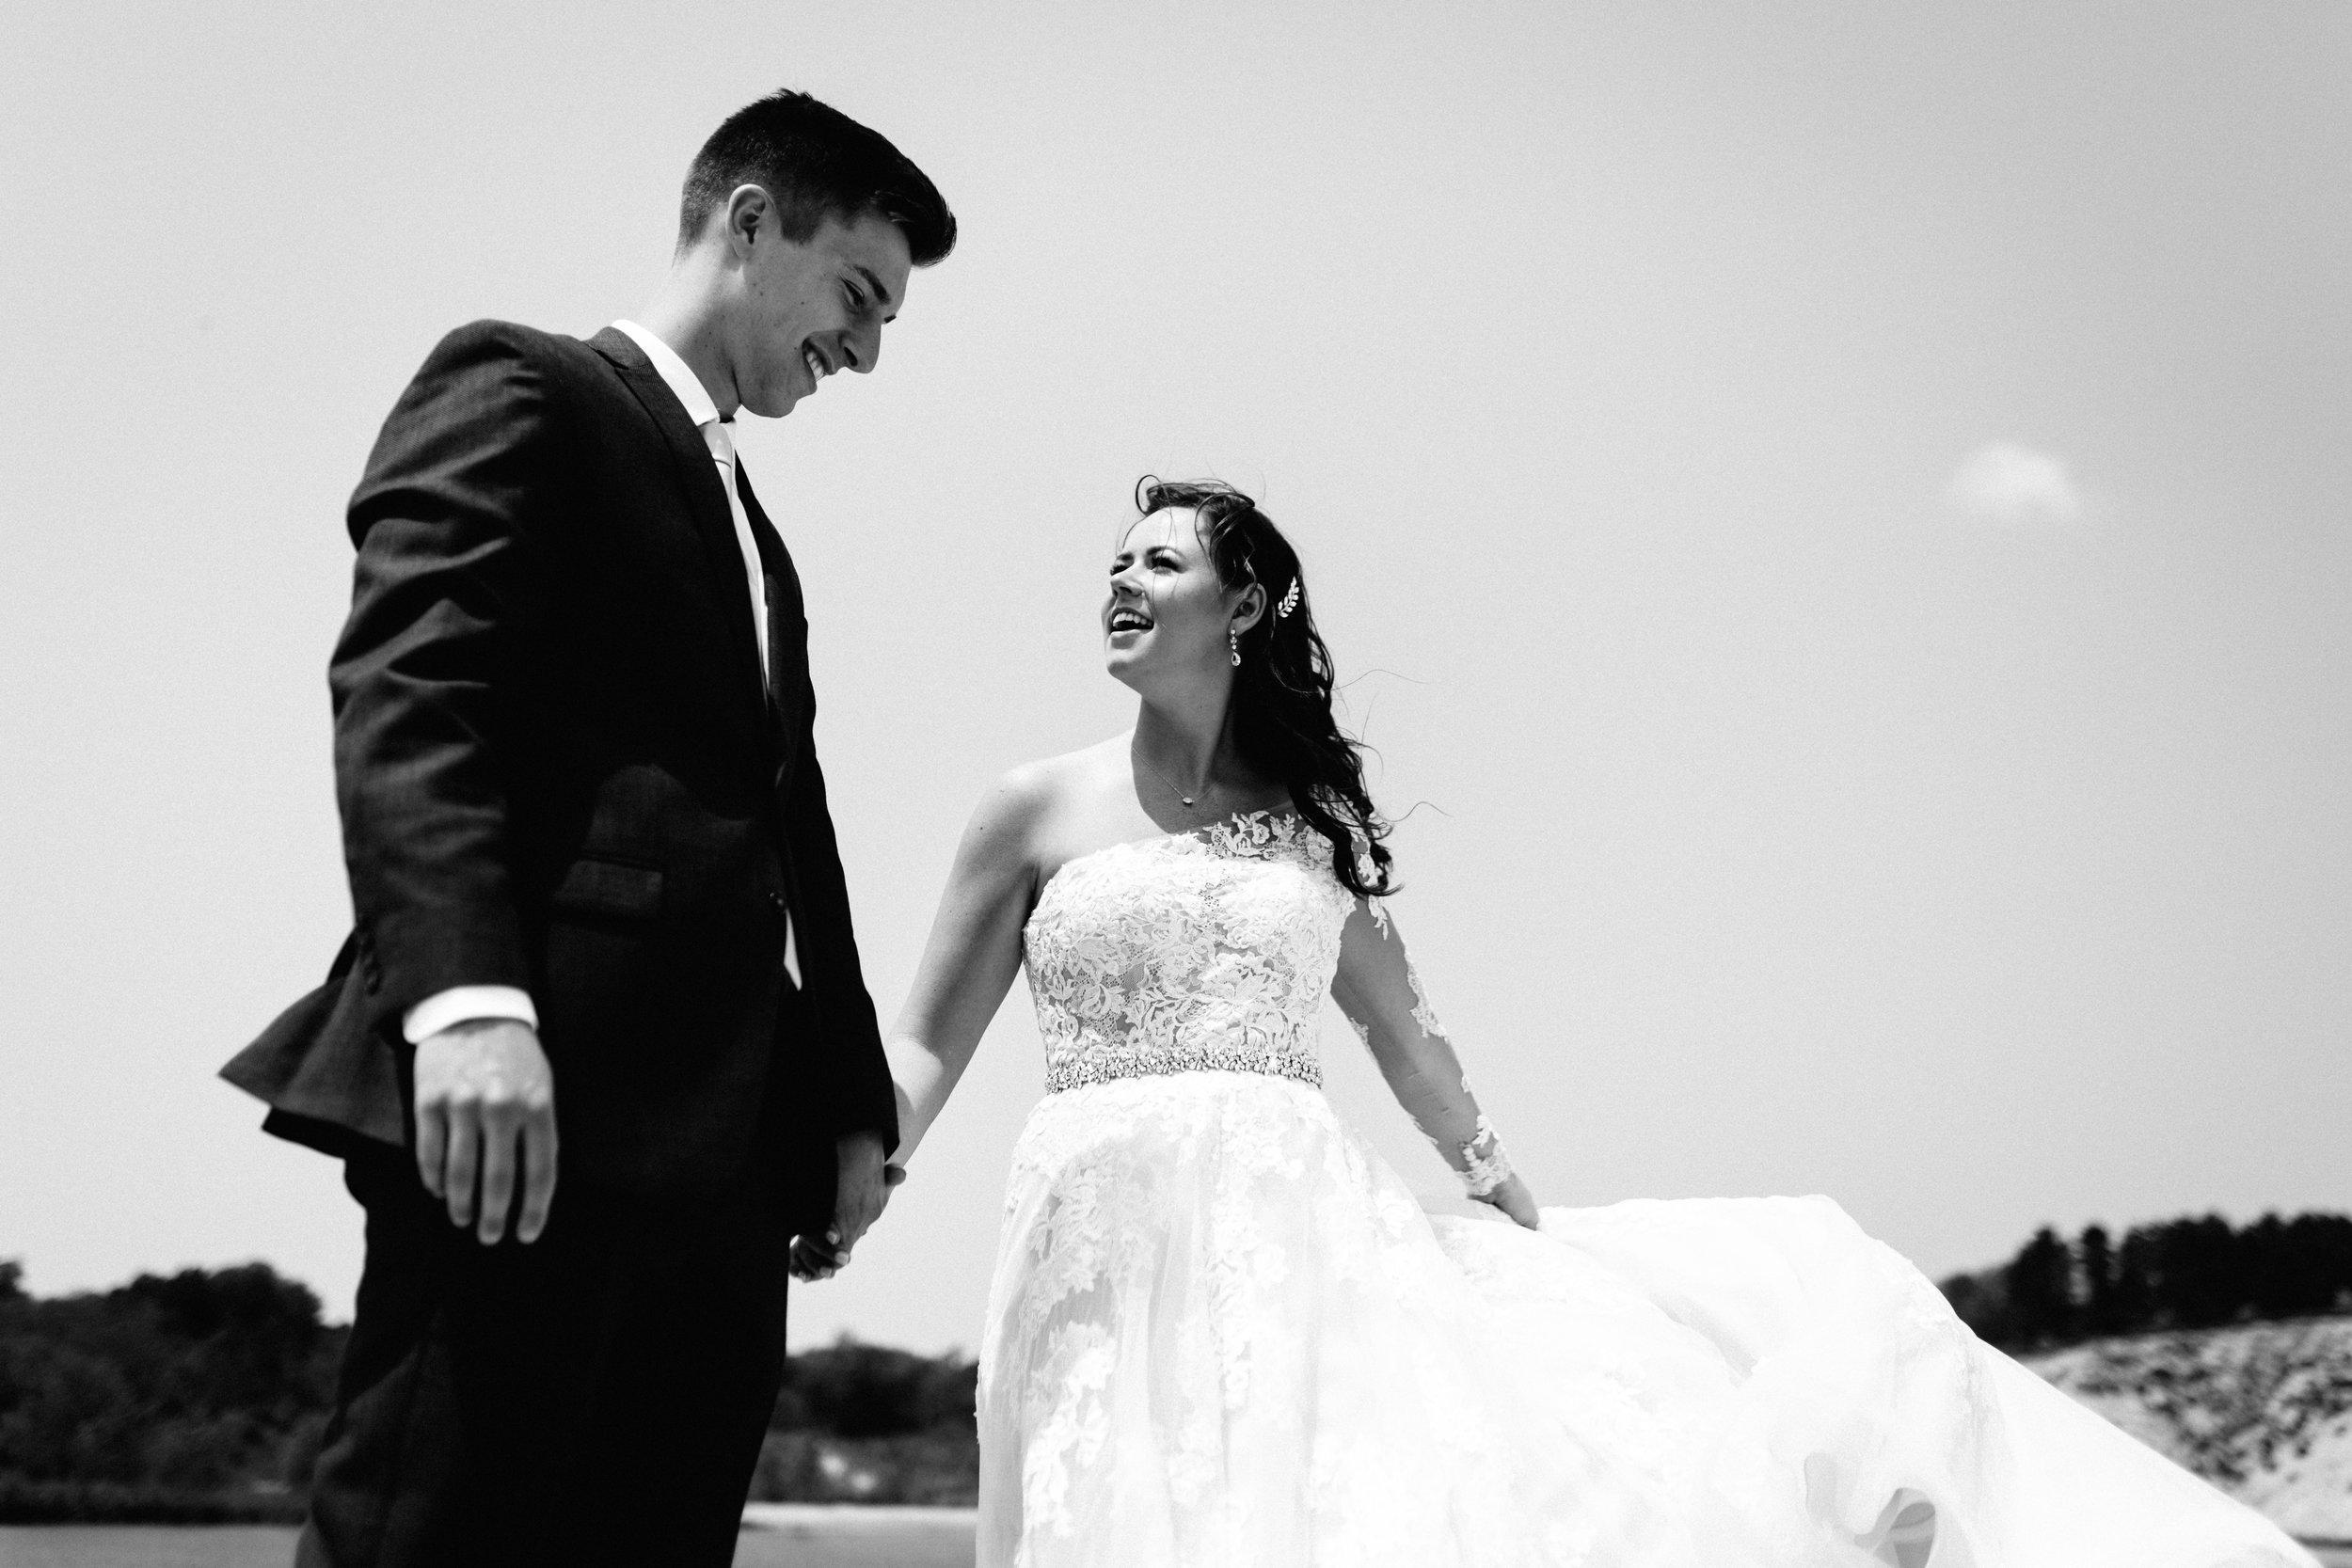 GRAYCENTOMHAMILTON-GRAND-RAPIDS-WEDDING-PHOTOGRAPHY-26.jpg